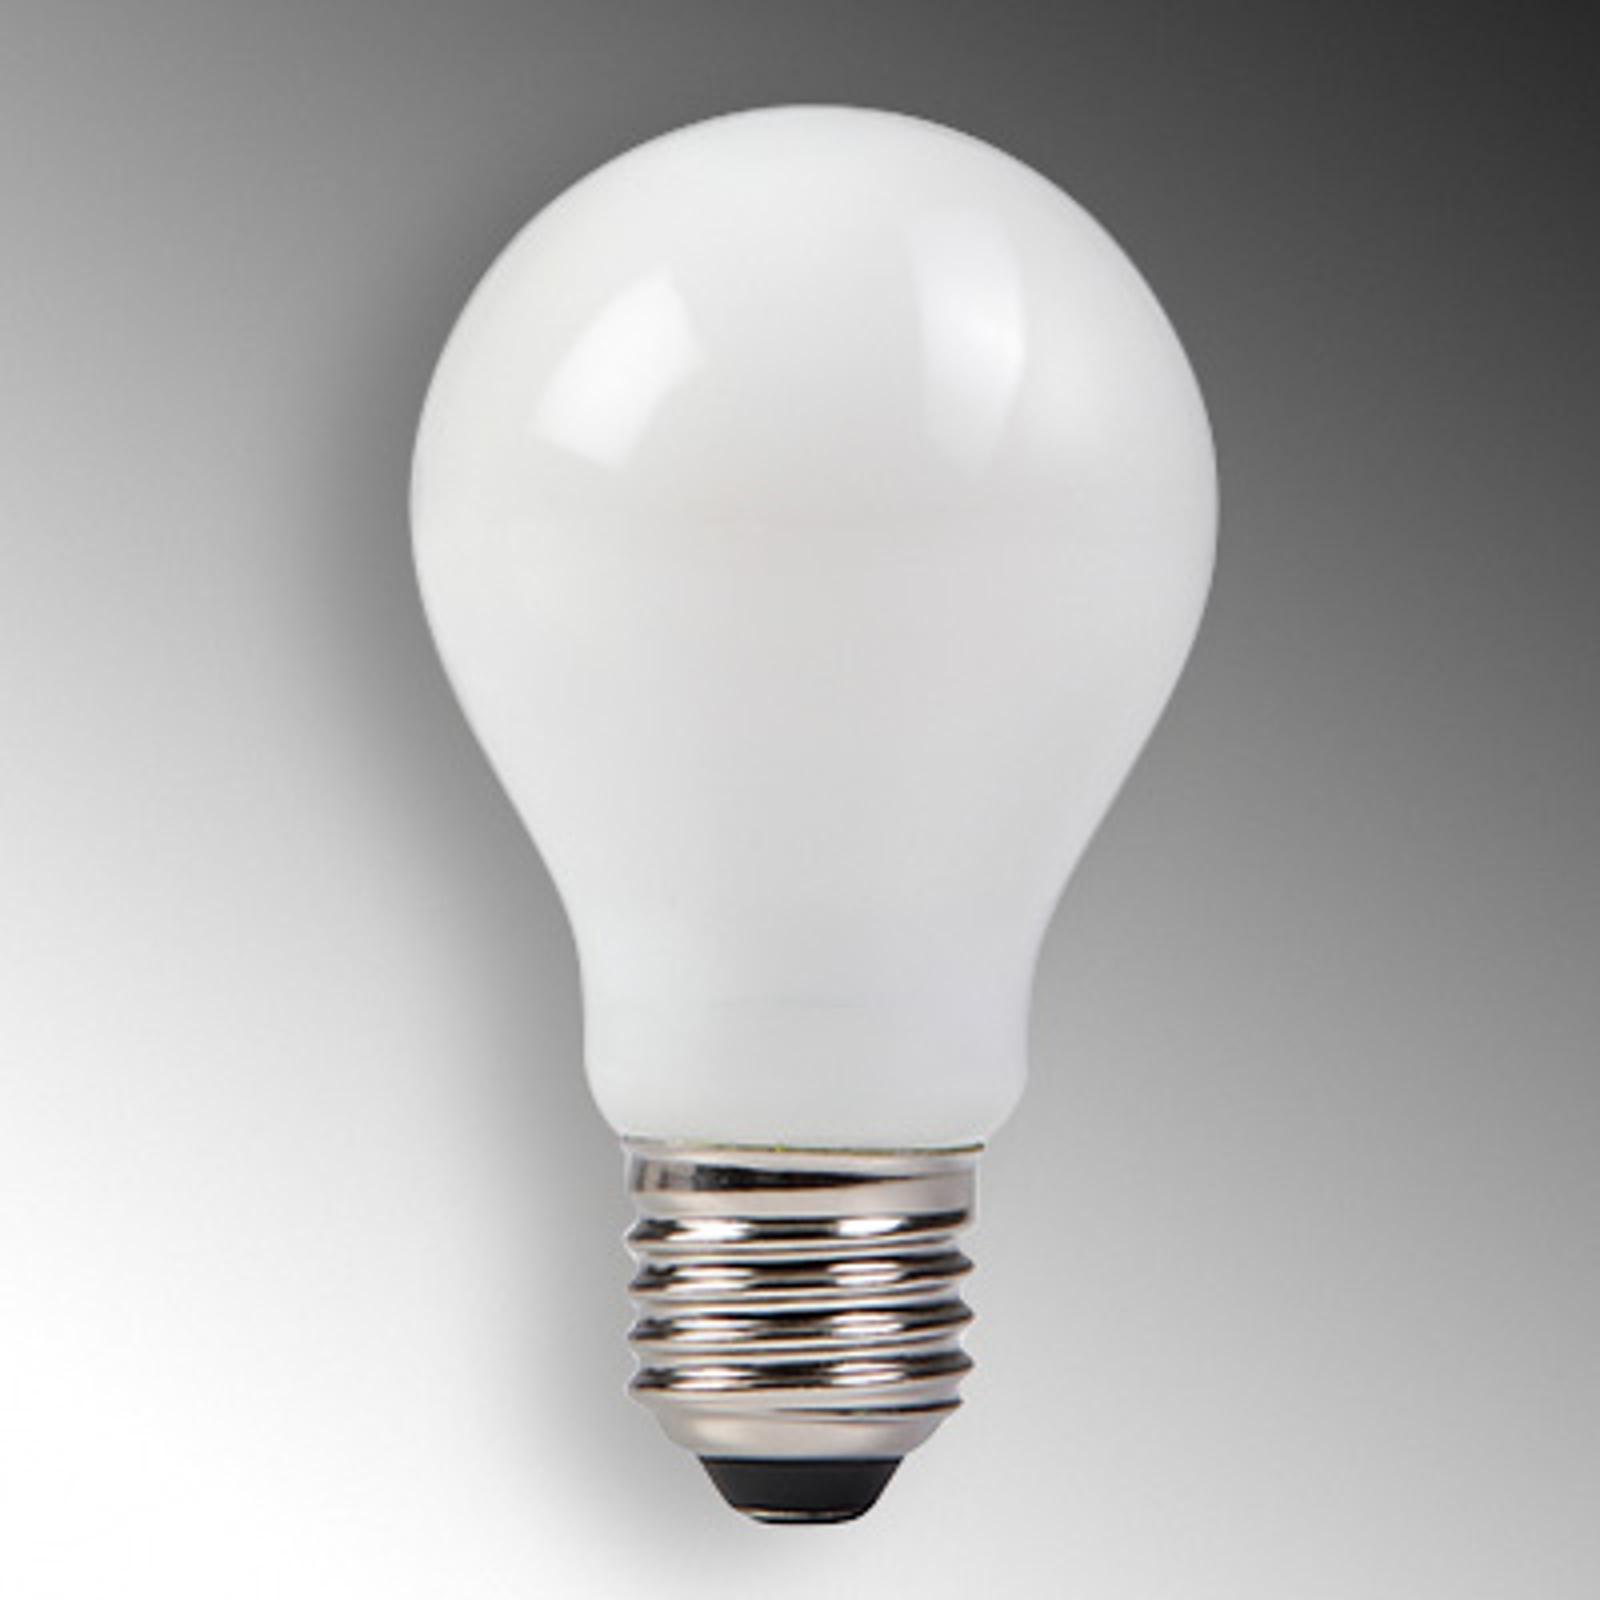 LED-Lampe E27 4,5W 827 satiniert